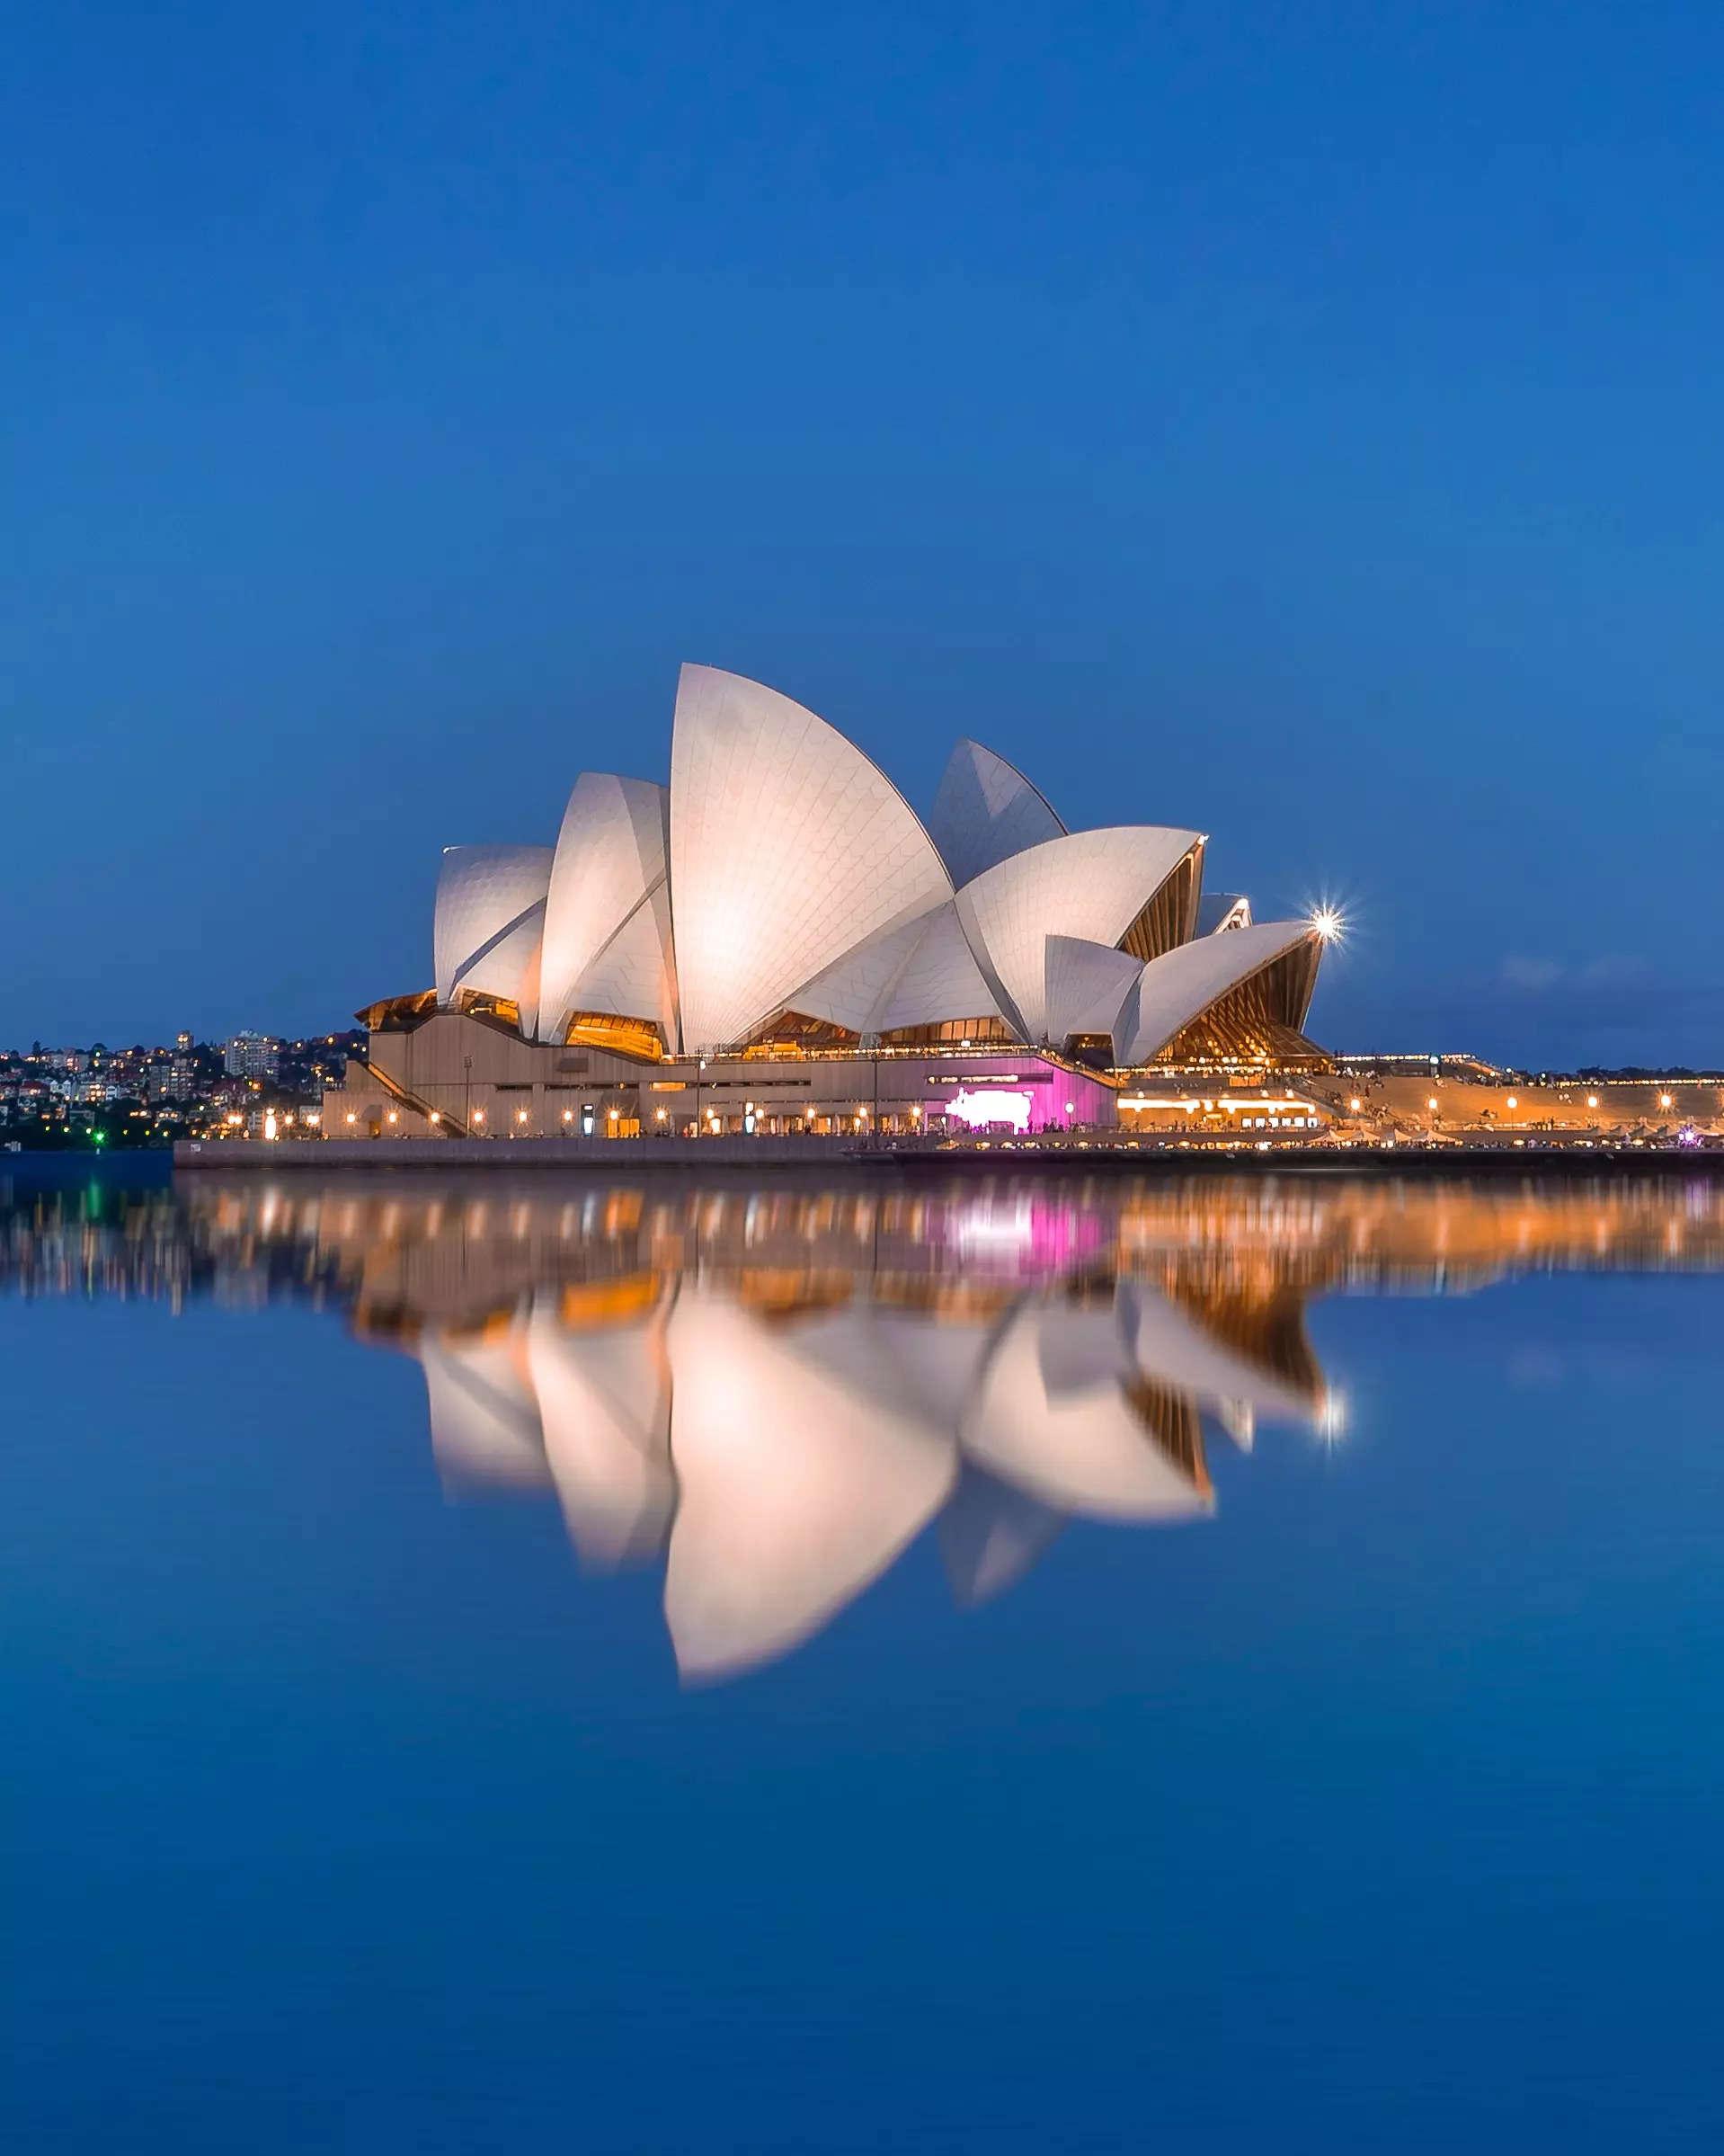 Australian PM Morrison announces reopening of international travel, easing border restrictions